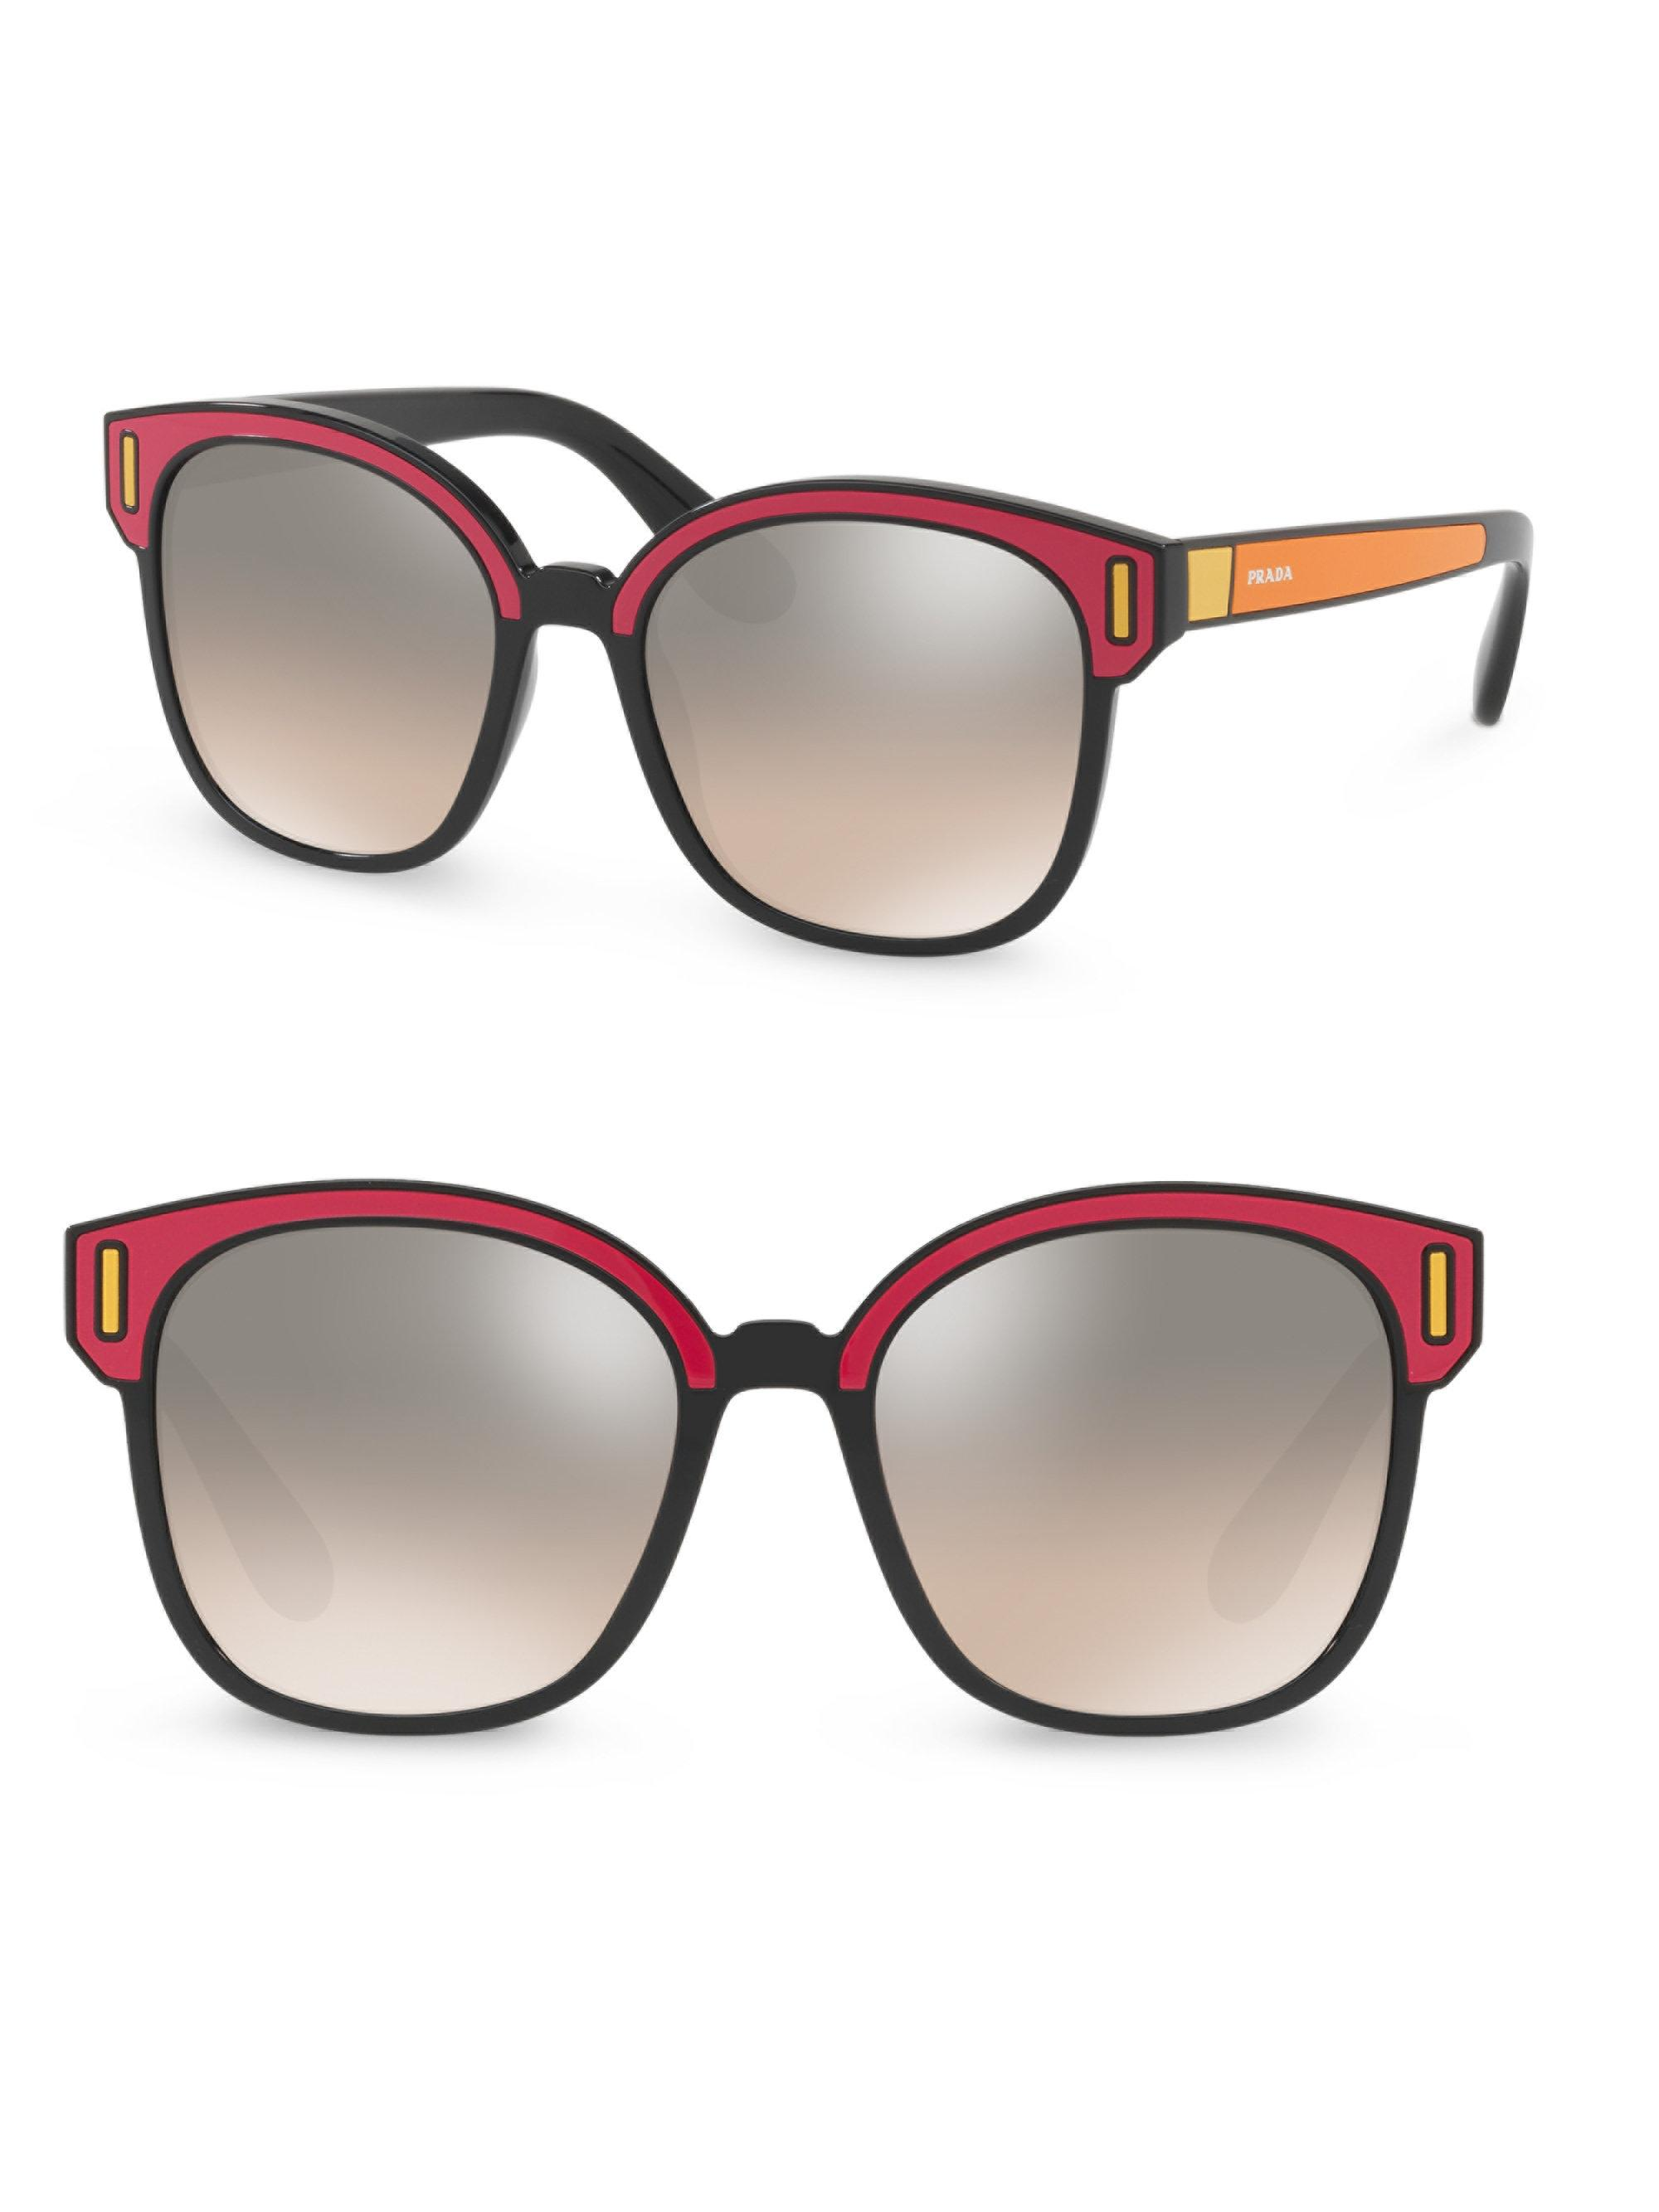 5c37ac615a8 ... order lyst prada color pop mirrored lens sunglasses in brown 2deb1 c7f4a